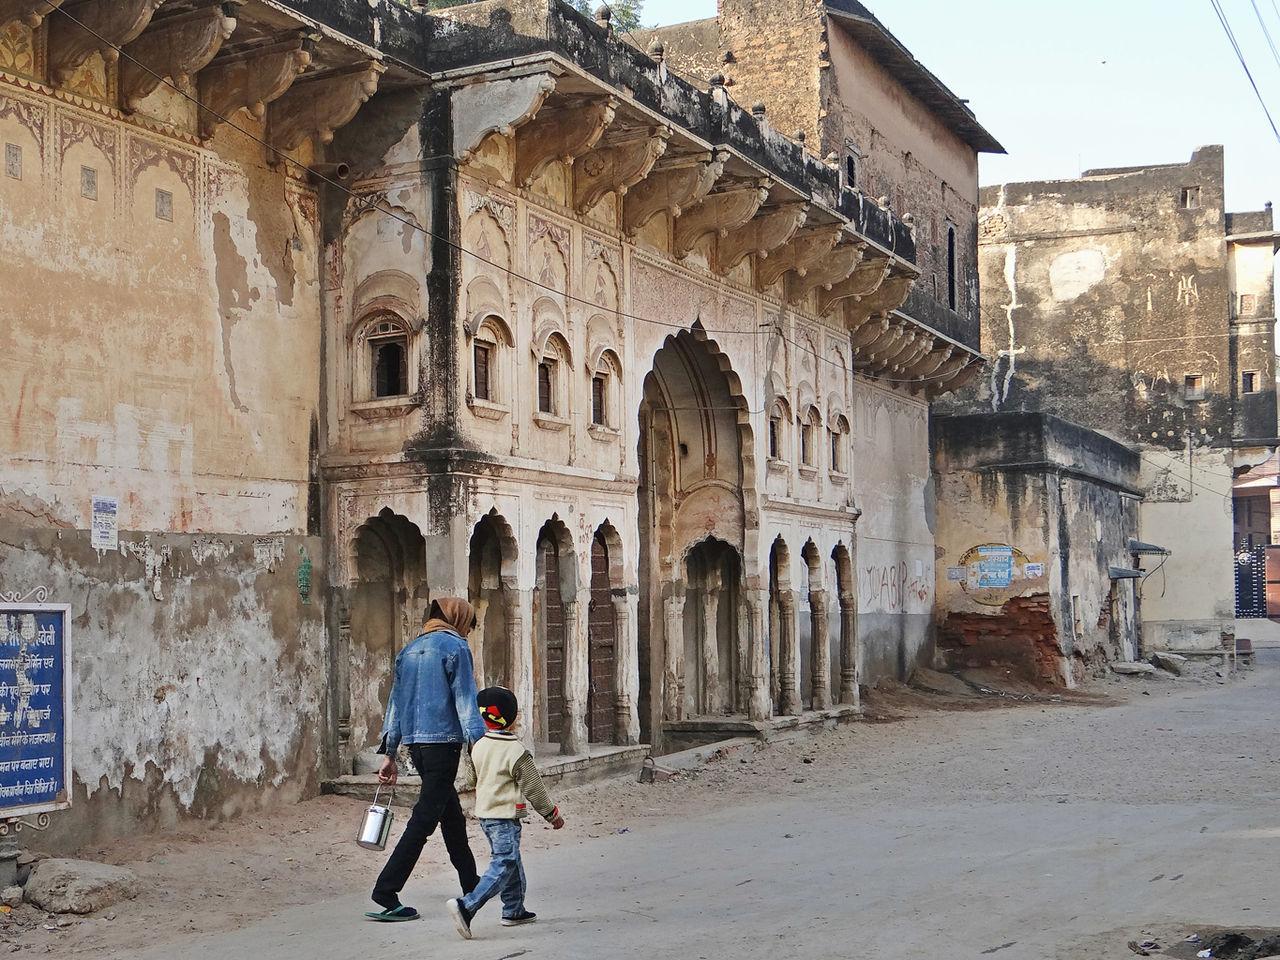 Shekhawati, History of Fatehpur, Rajasthan